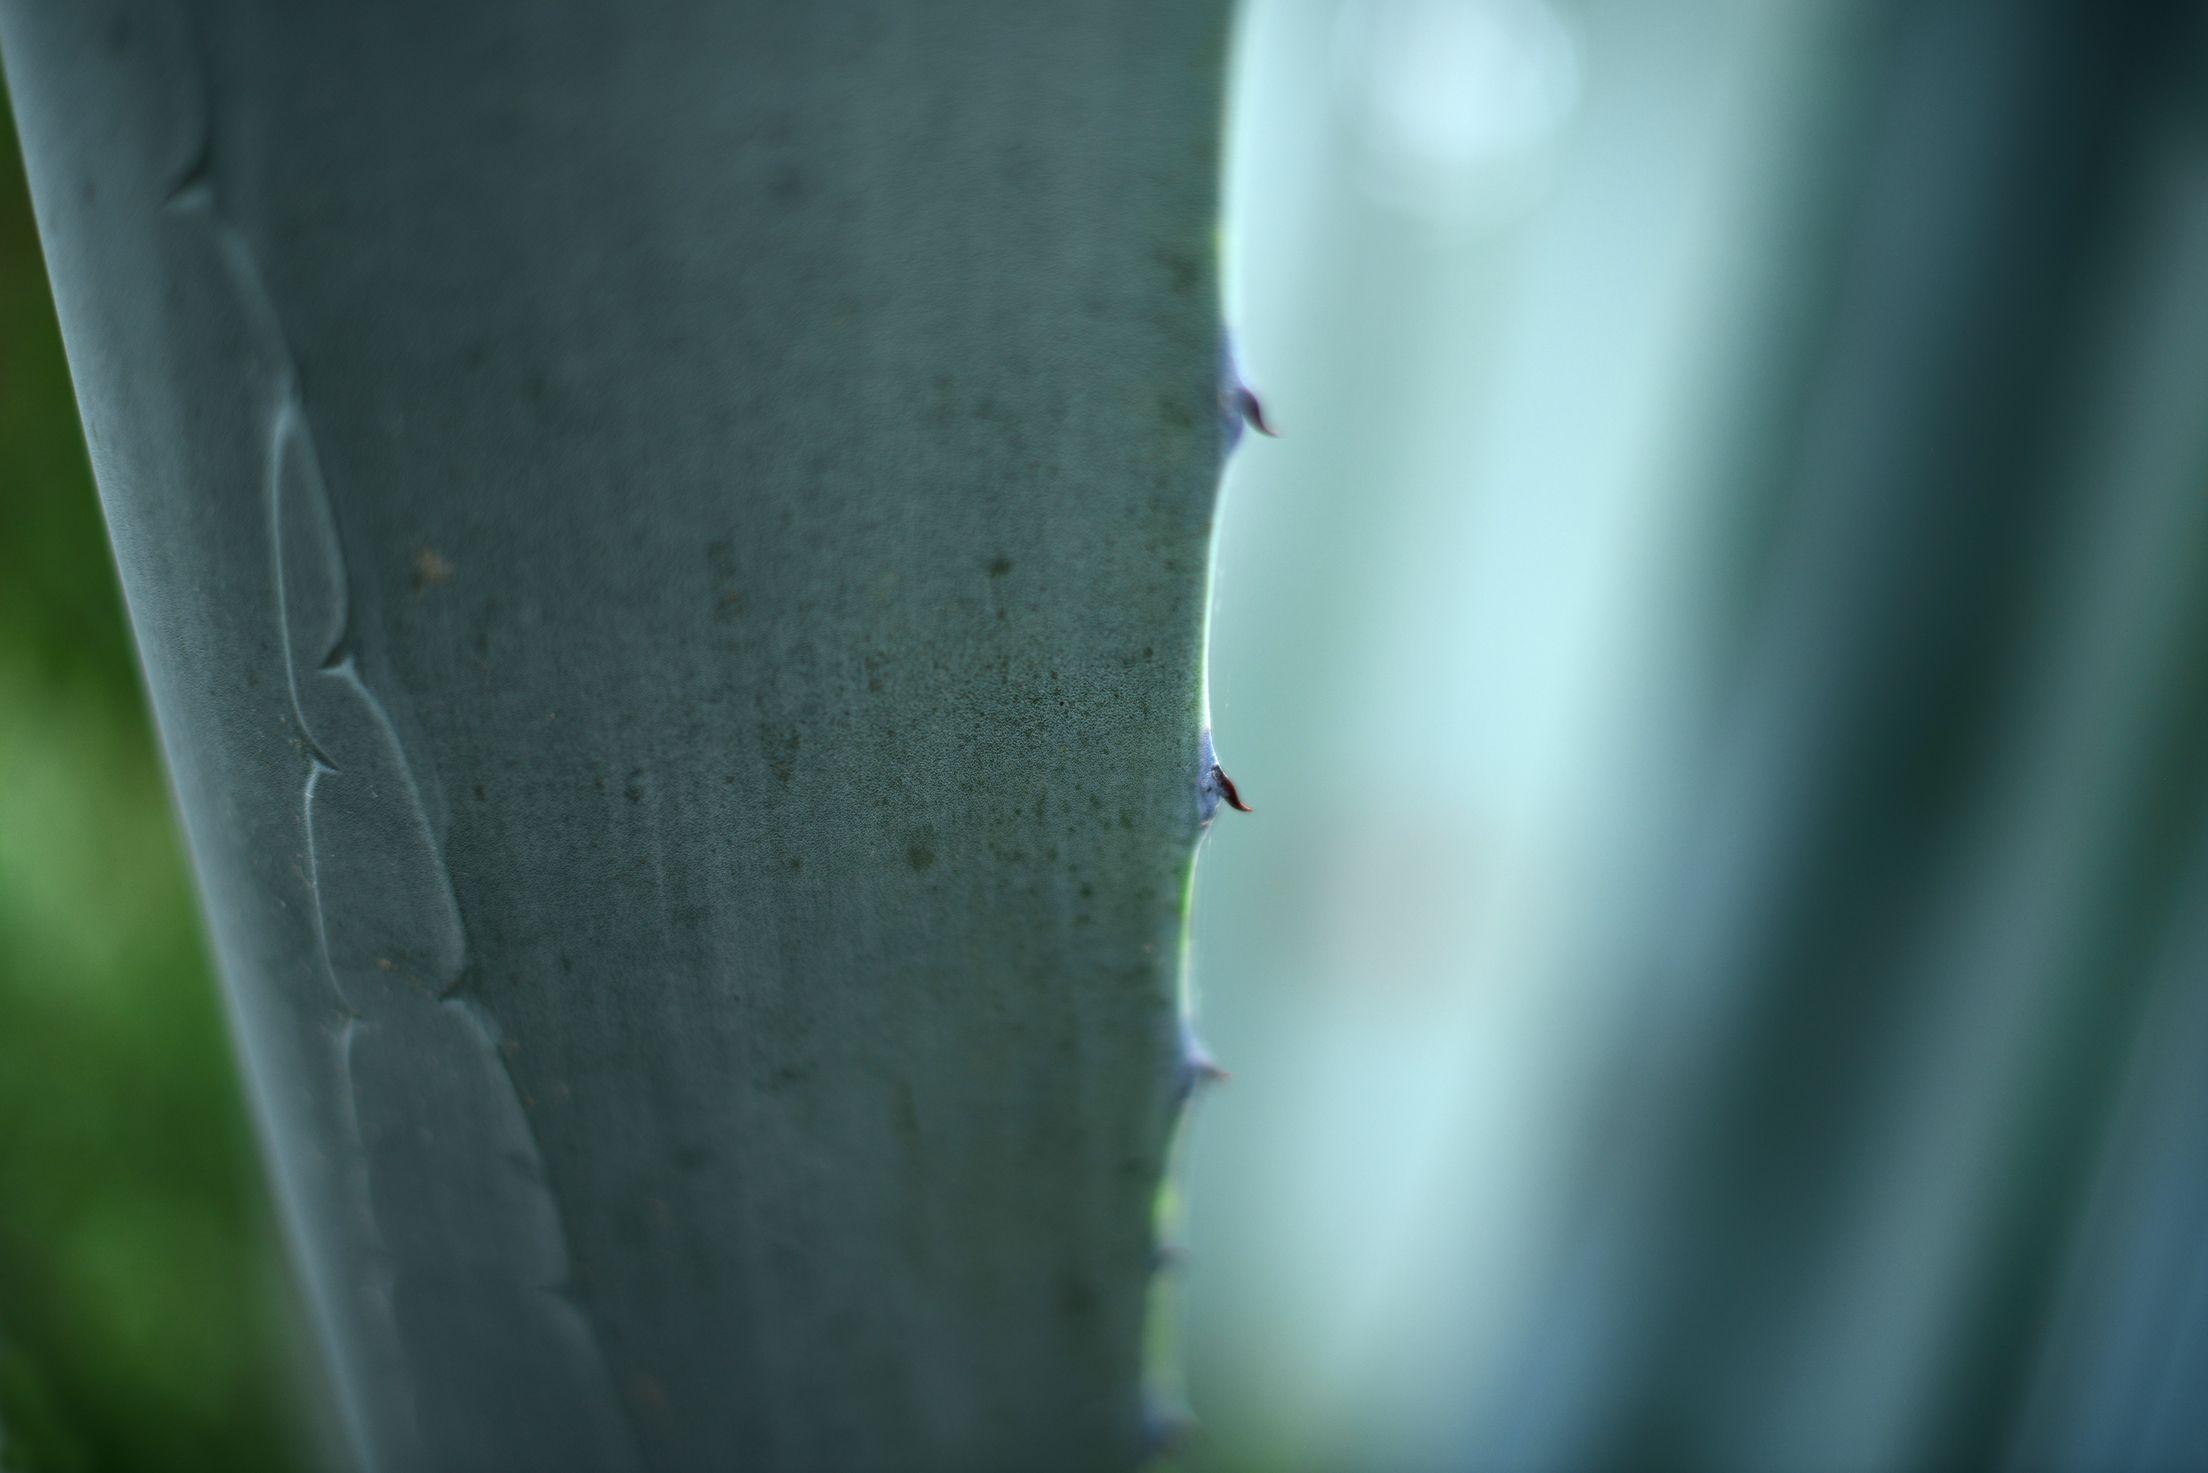 nature_2_cactus_aotearoa_2_2015-04-09 00.00.11.jpg